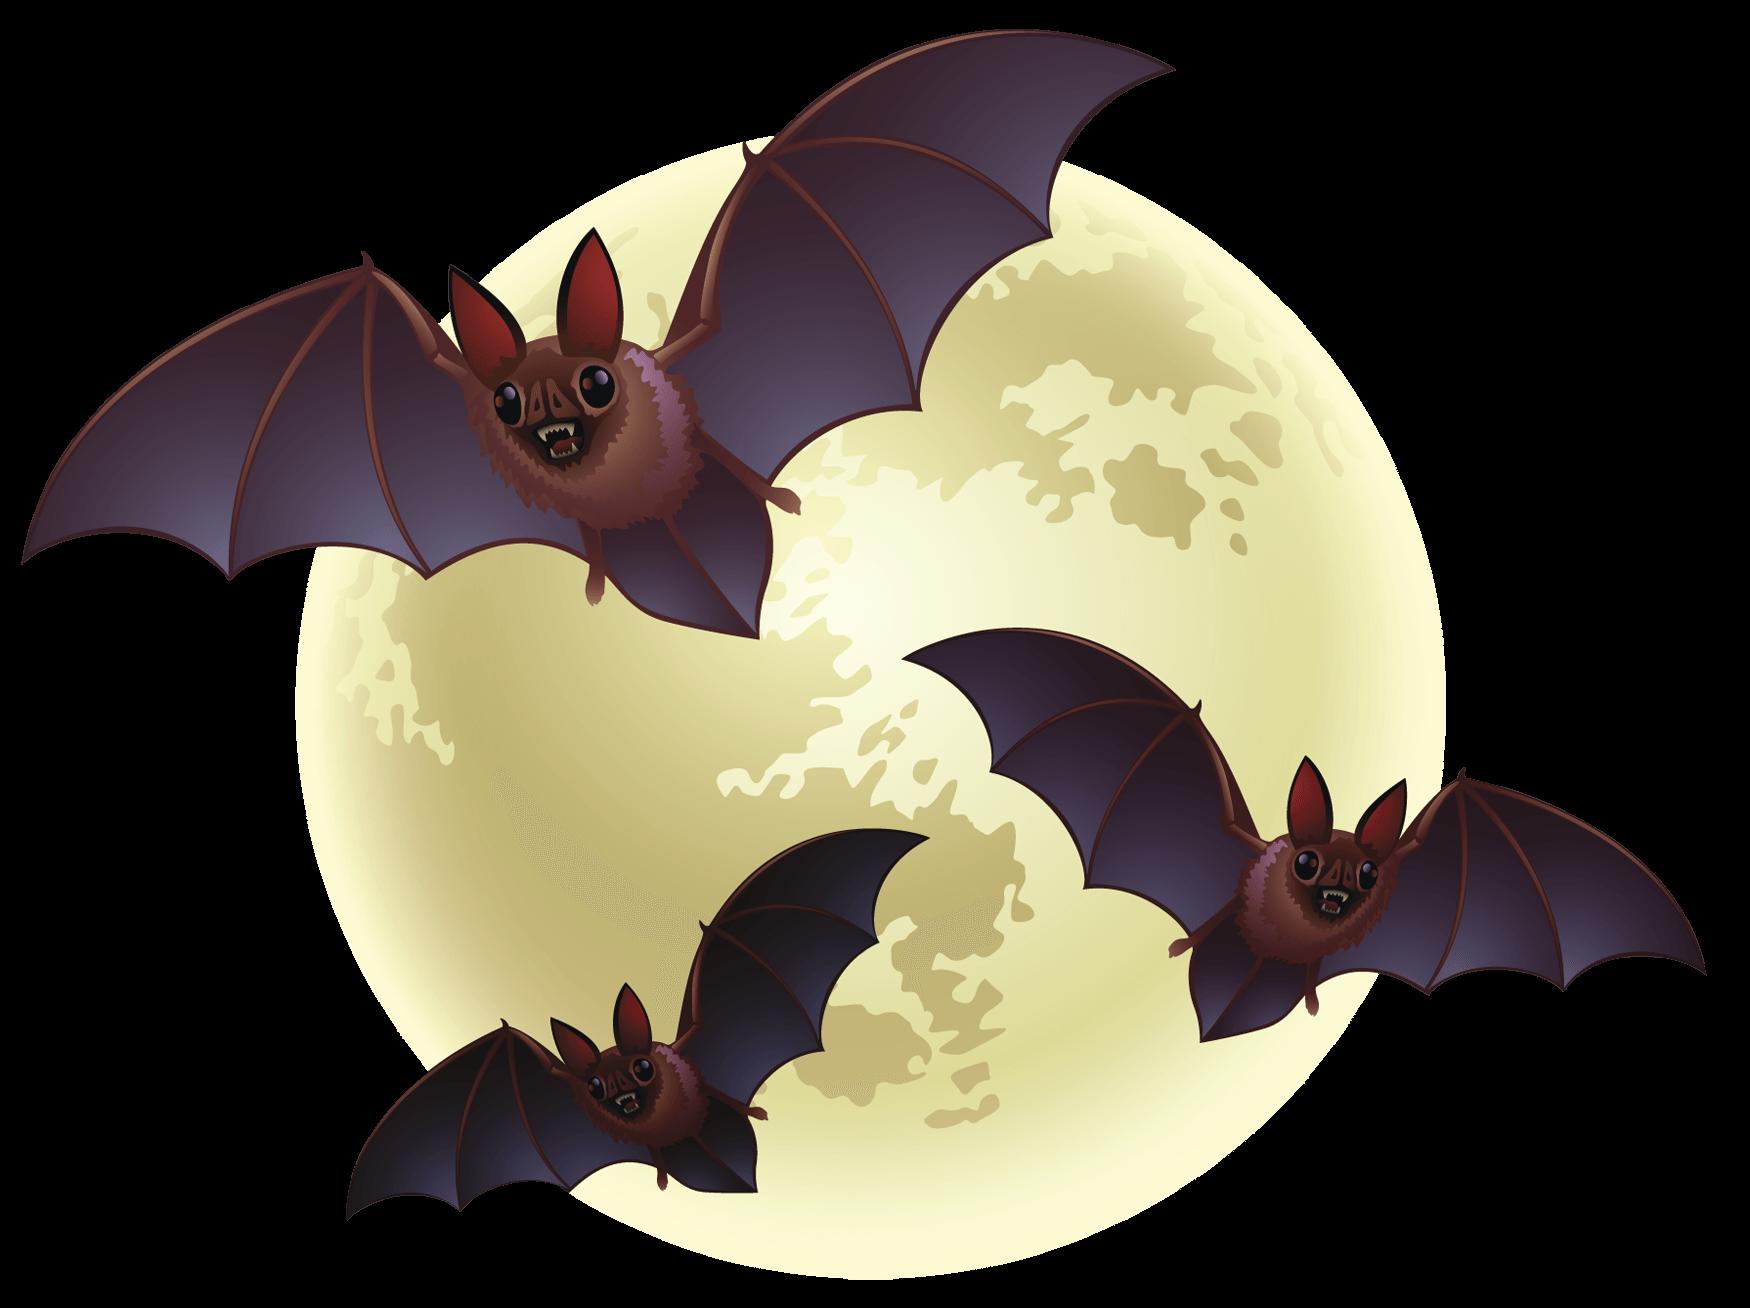 Clipart halloween transparent background. Creepy bats png stickpng